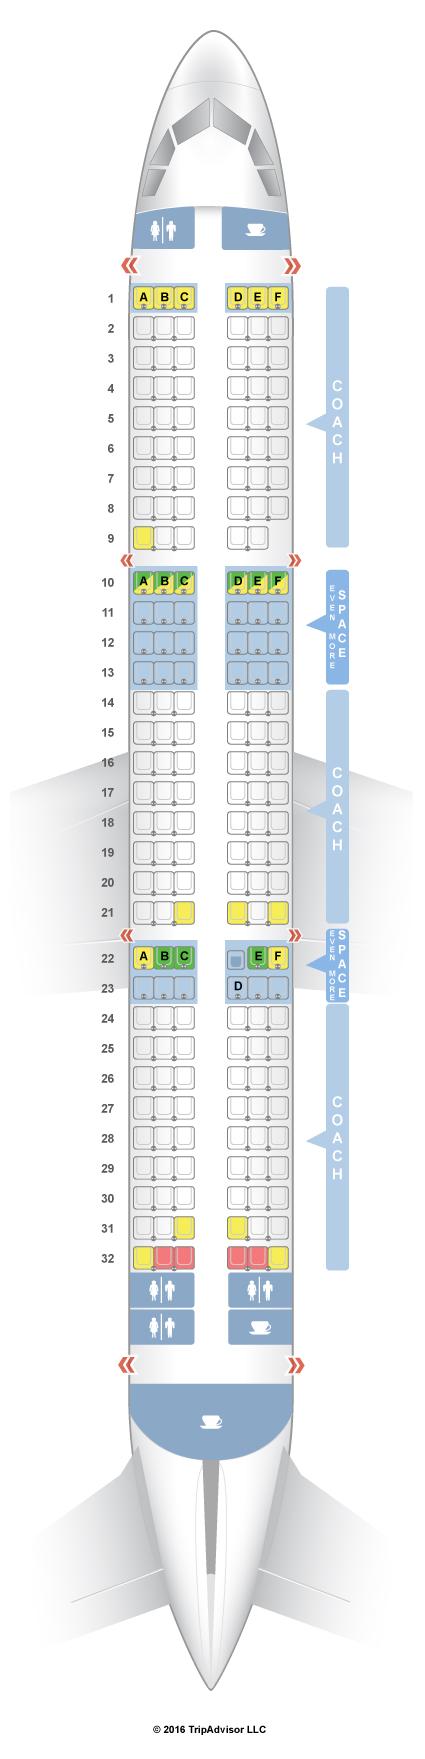 jetblue plane seating chart - Yobi.karikaturize.com